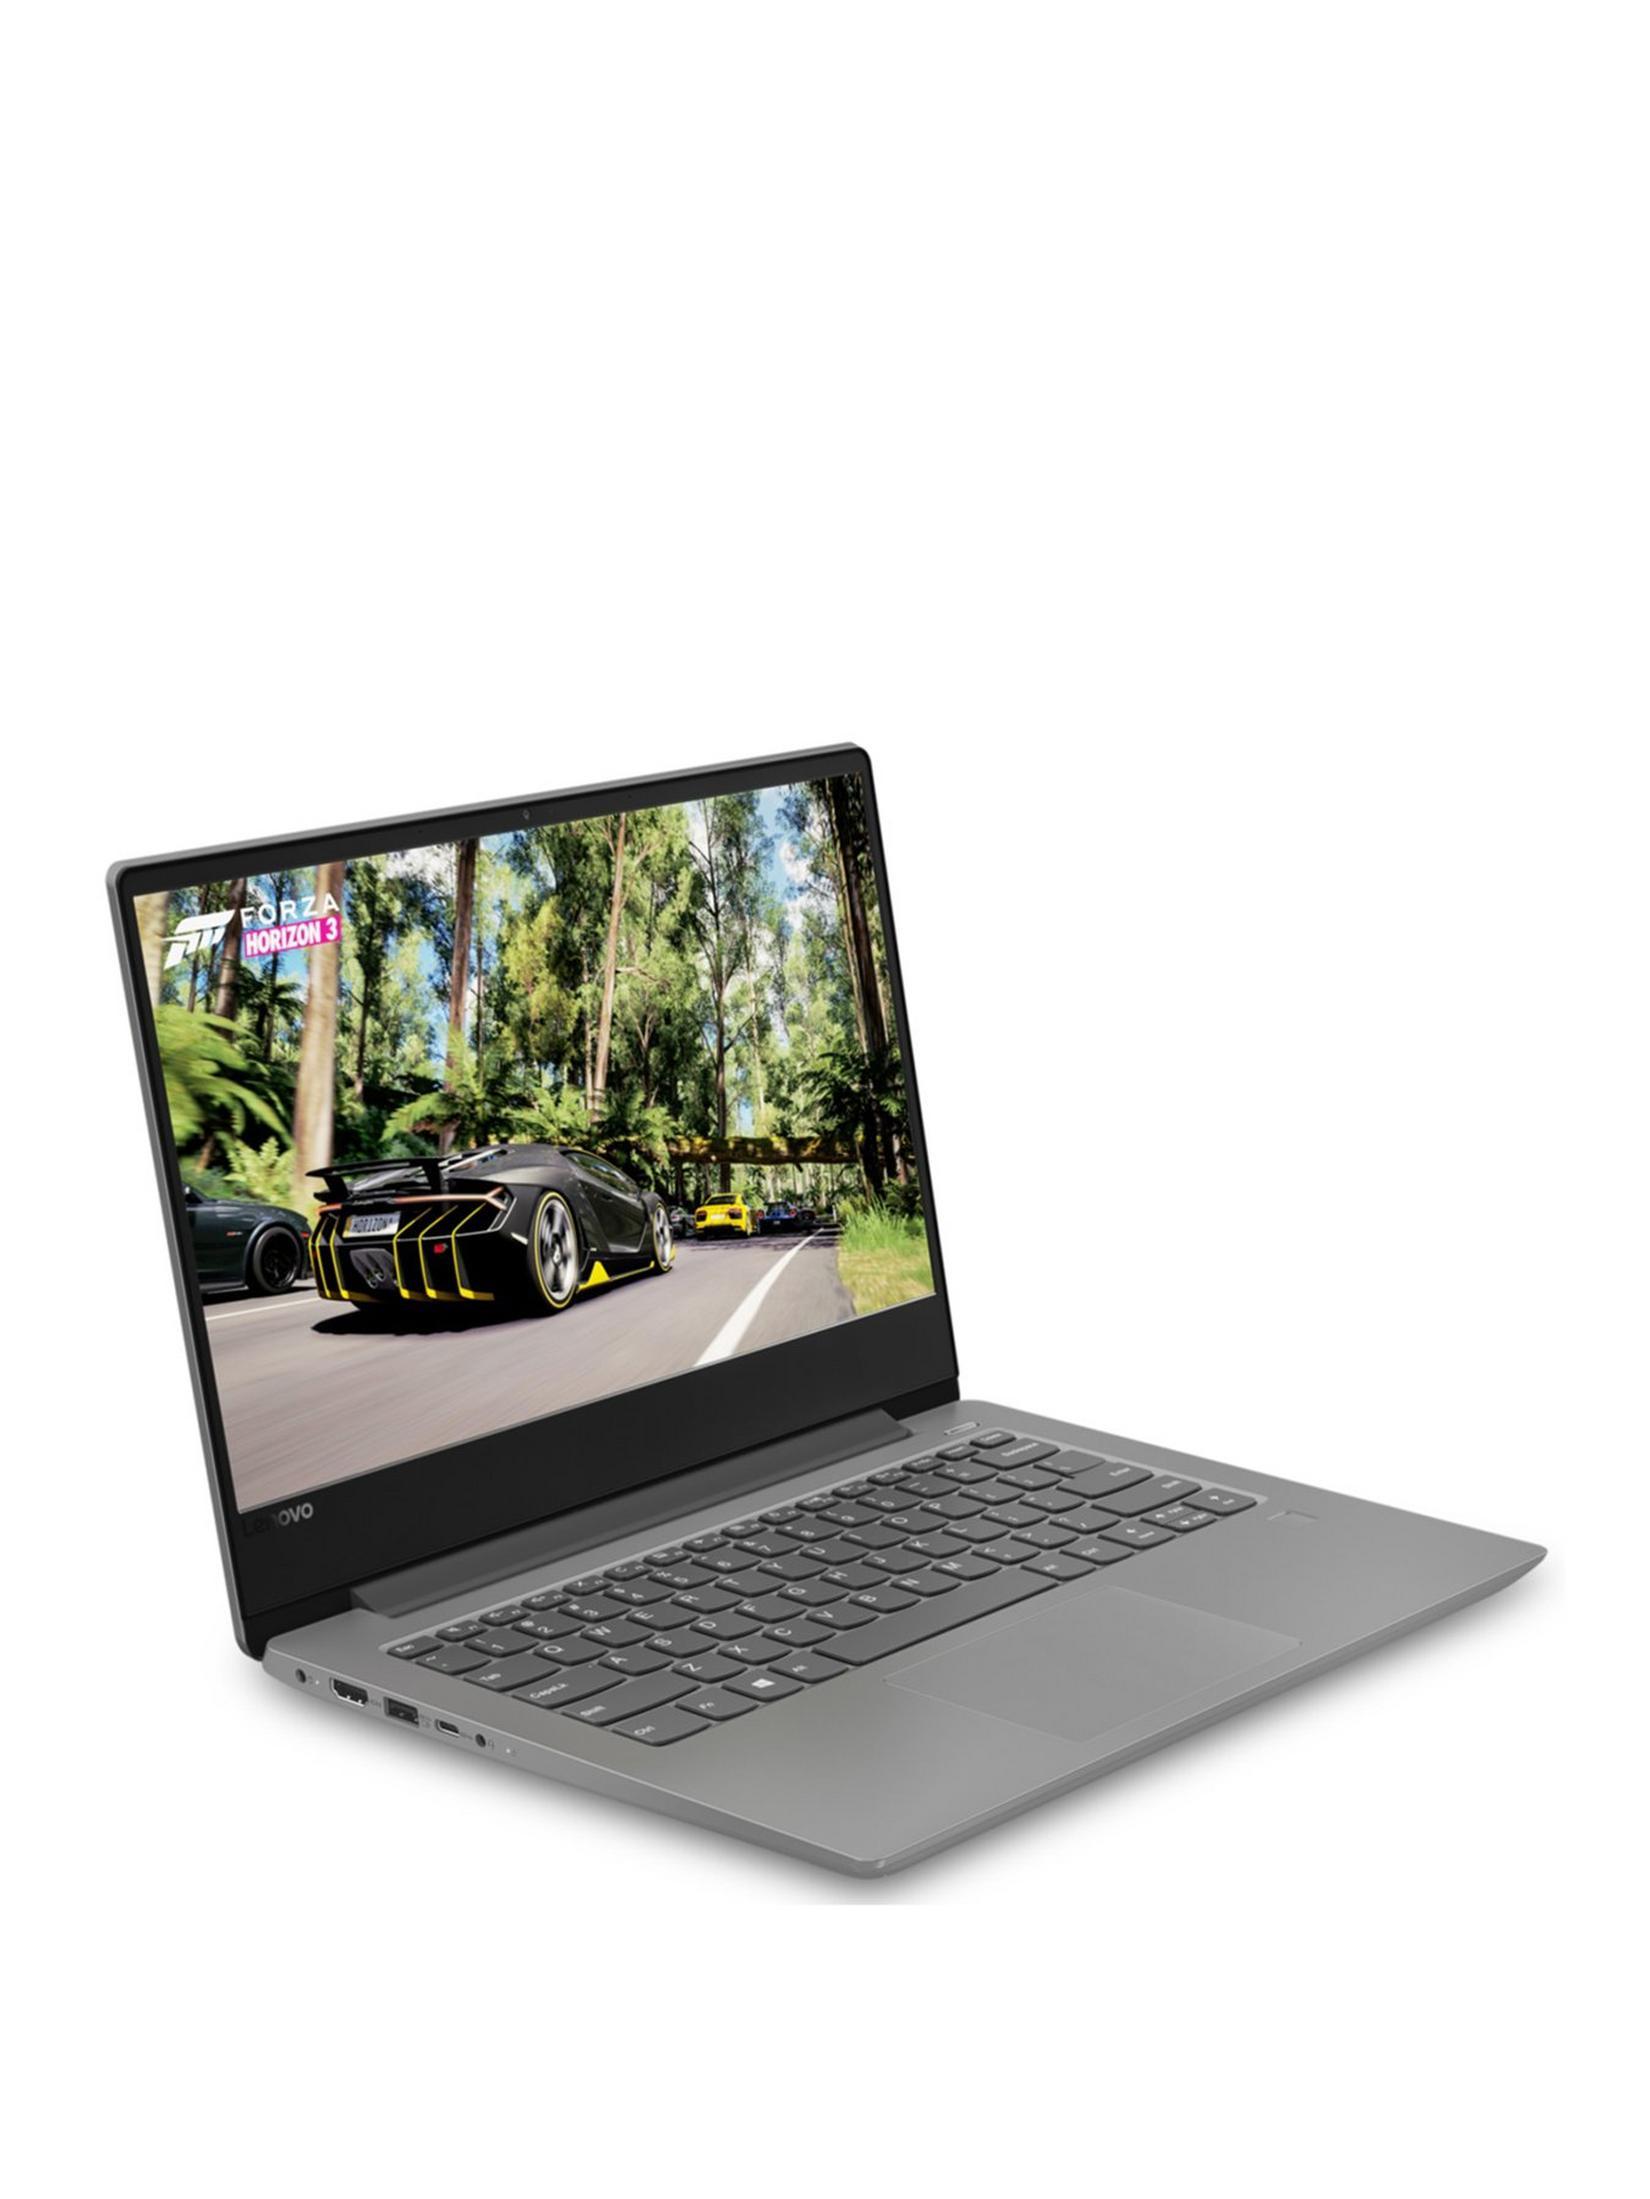 Lenovo IdeaPad 330S-14IKB Intel Pentium, 4Gb RAM, 128Gb SSD, 14 inch Laptop £289.99 @ Very